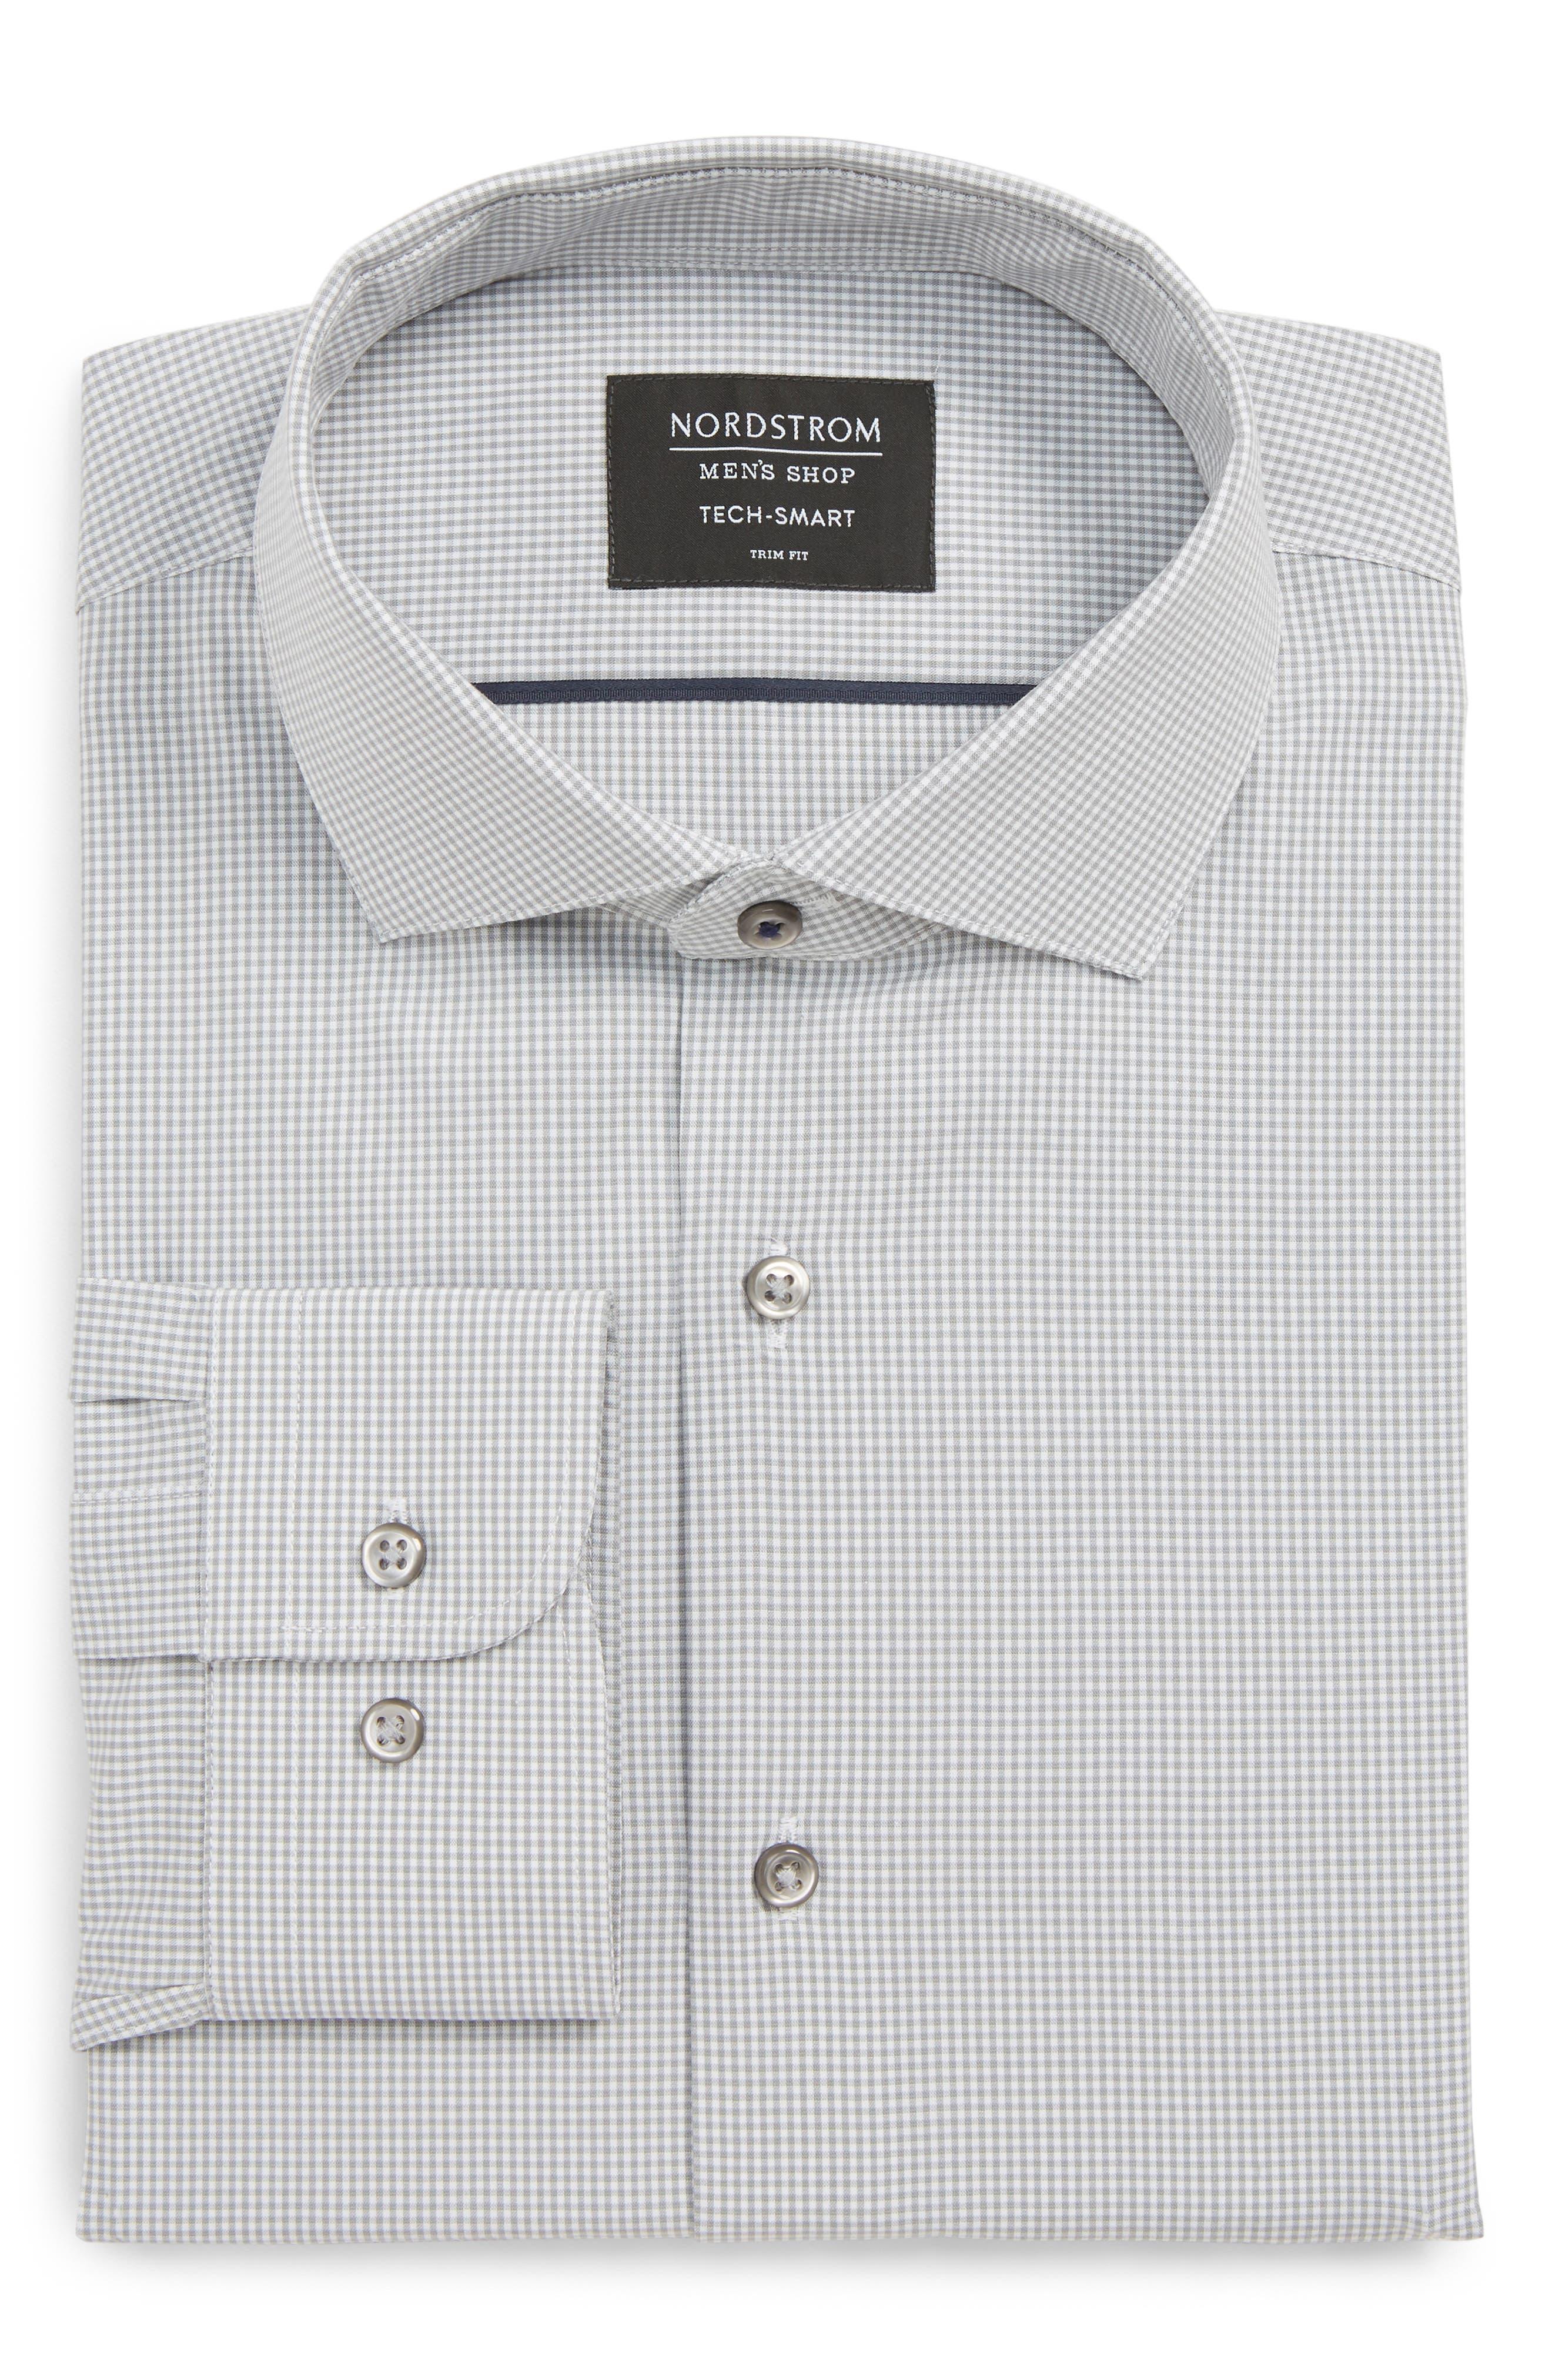 Tech-Smart Trim Fit Stretch Check Dress Shirt,                             Main thumbnail 1, color,                             GREY SLEET